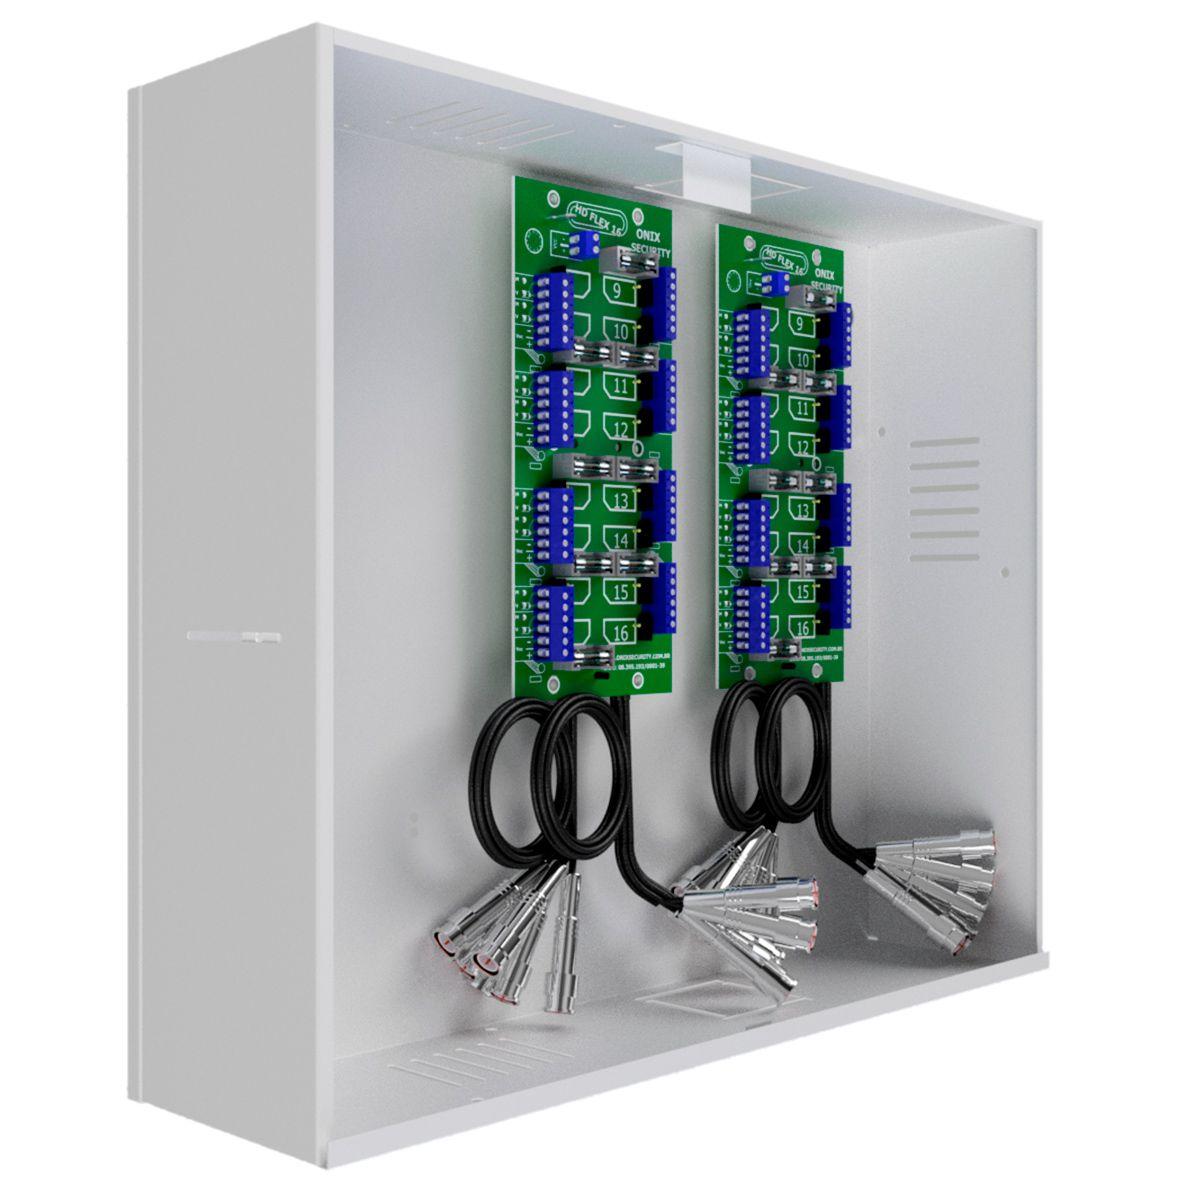 Rack Organizador HD e Analógico,Saturno HD, 32 Canais, Onix Security  - Tudo Forte